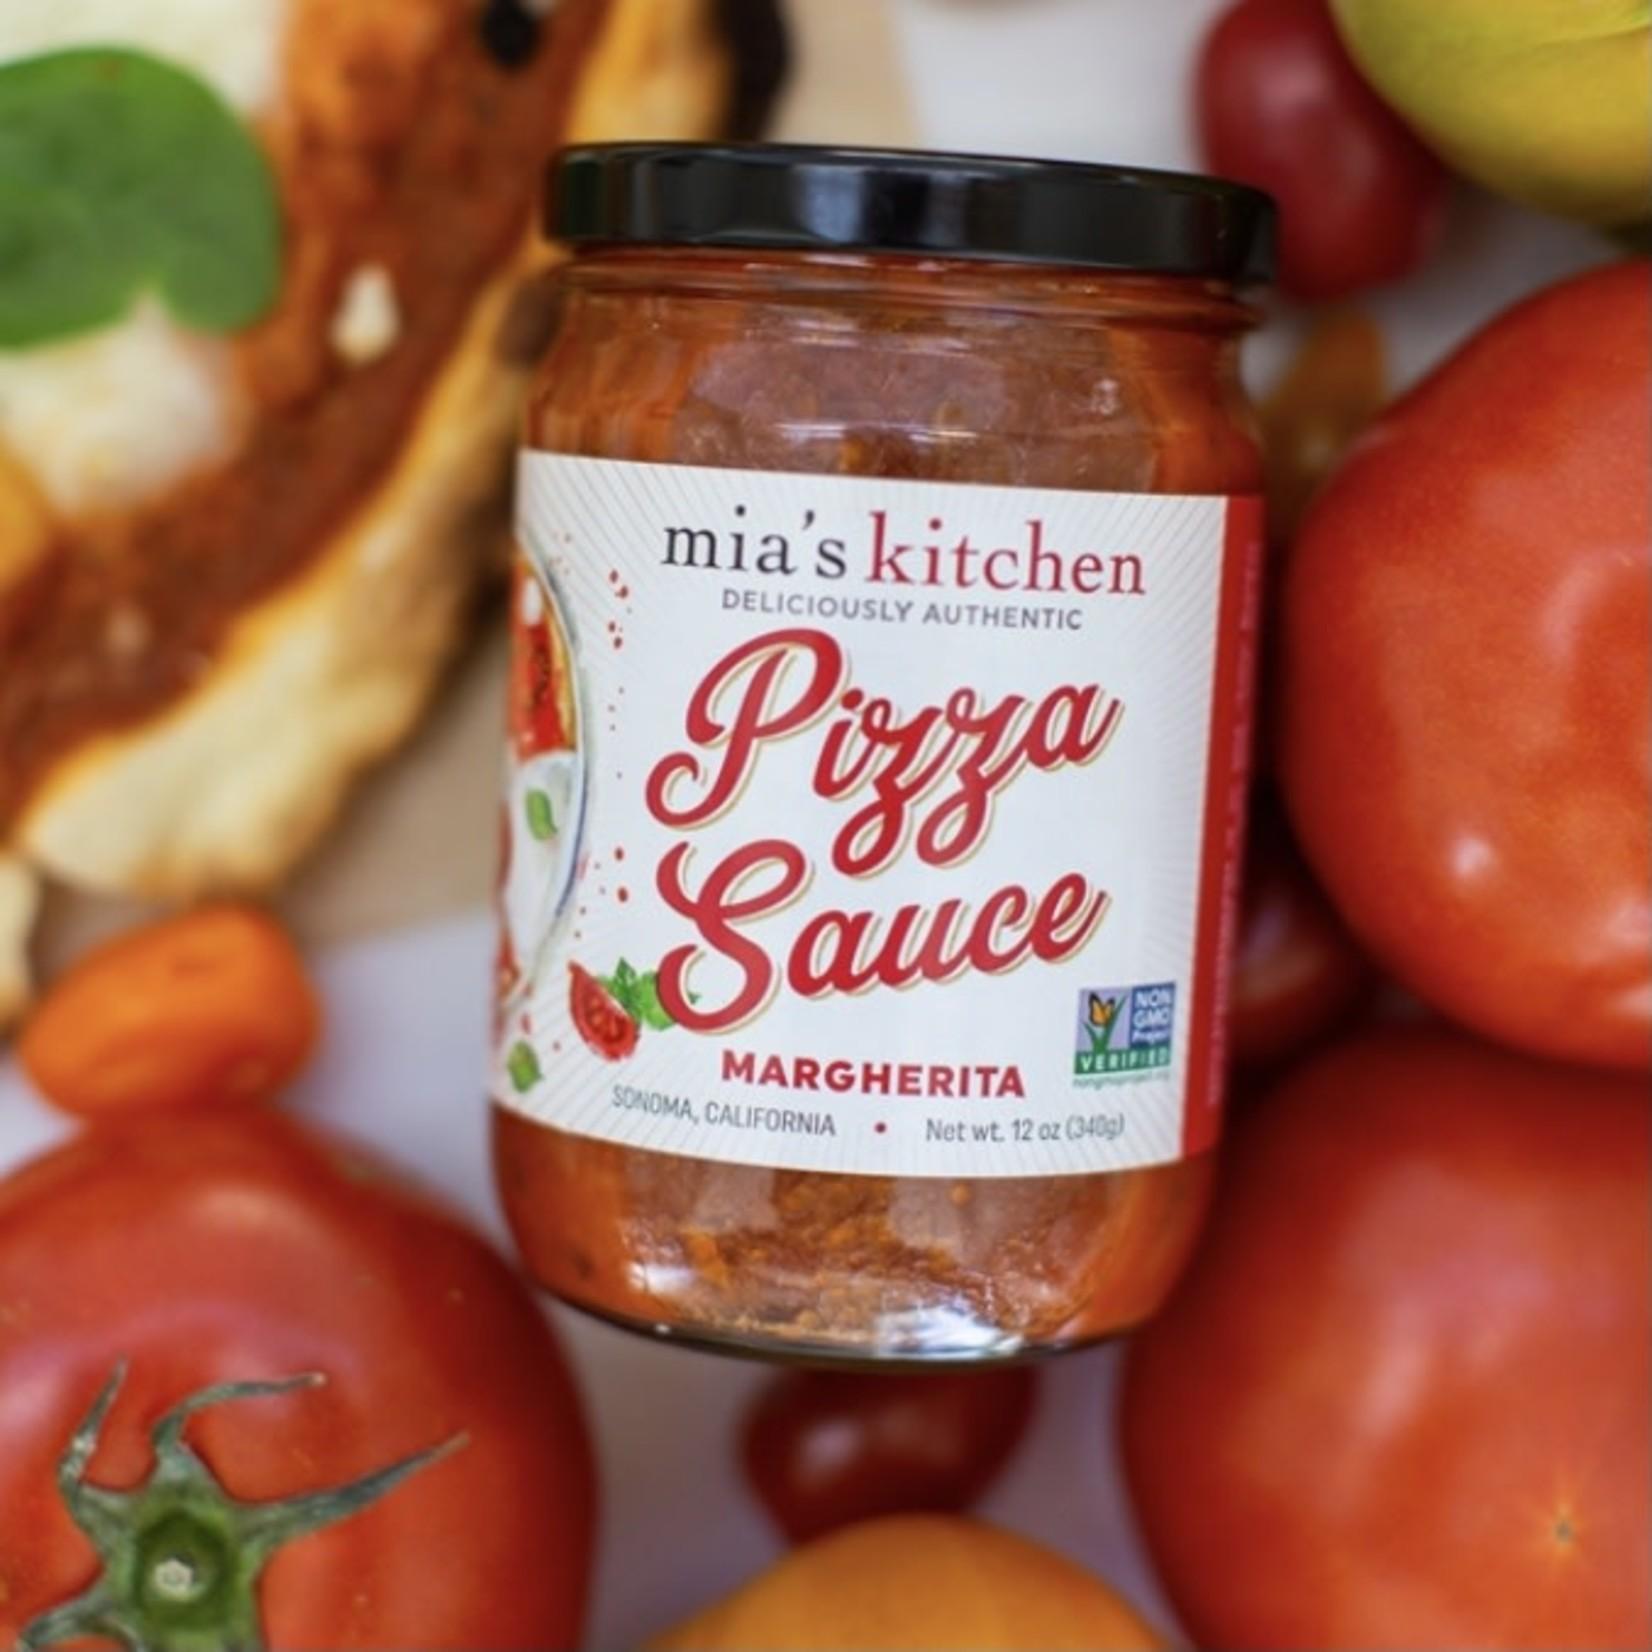 Mia's Kitchen Mia's Kitchen Margherita Pizza Sauce 340ml